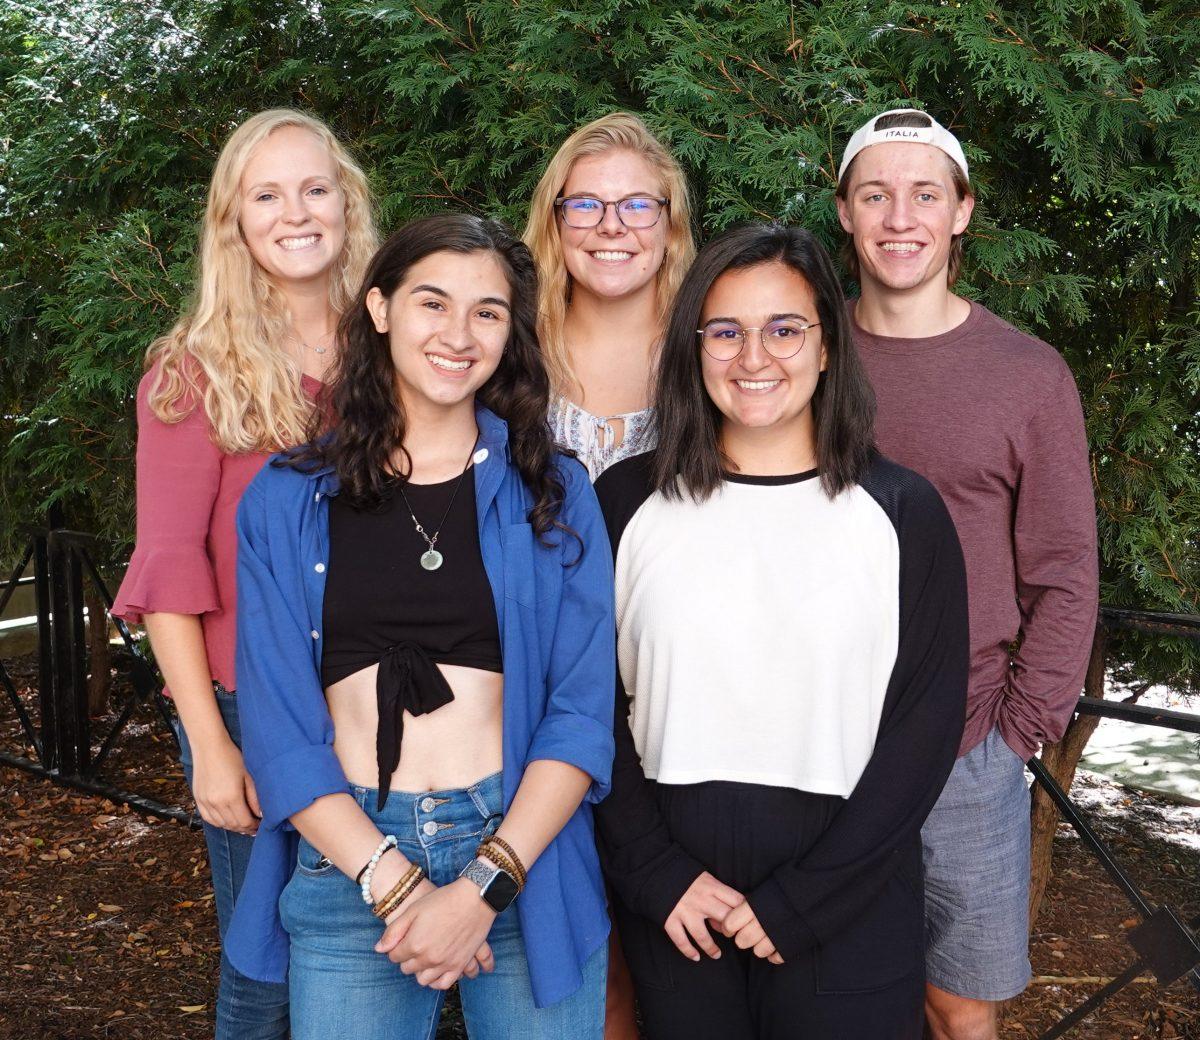 Fall 2019 Green Labs Interns. From L-R Meg DiPoto, Norma Behrend-Martinez, Marina Steiner, Sanauz Alaei, Riley Collins.